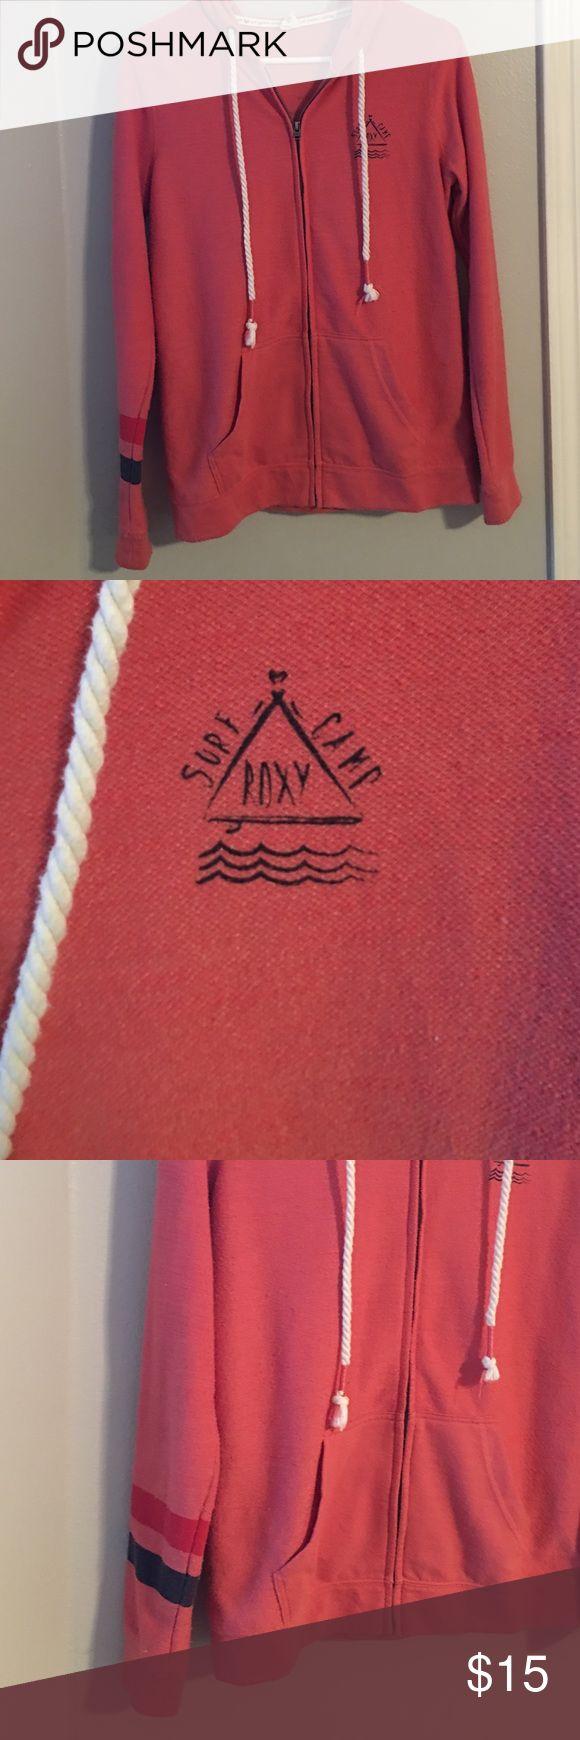 Roxy zip up hoodie Red orange zip up Roxy Surf Camp hoodie.  Red and blue stripe on right arm.  Gently worn,  good condition. Roxy Tops Sweatshirts & Hoodies